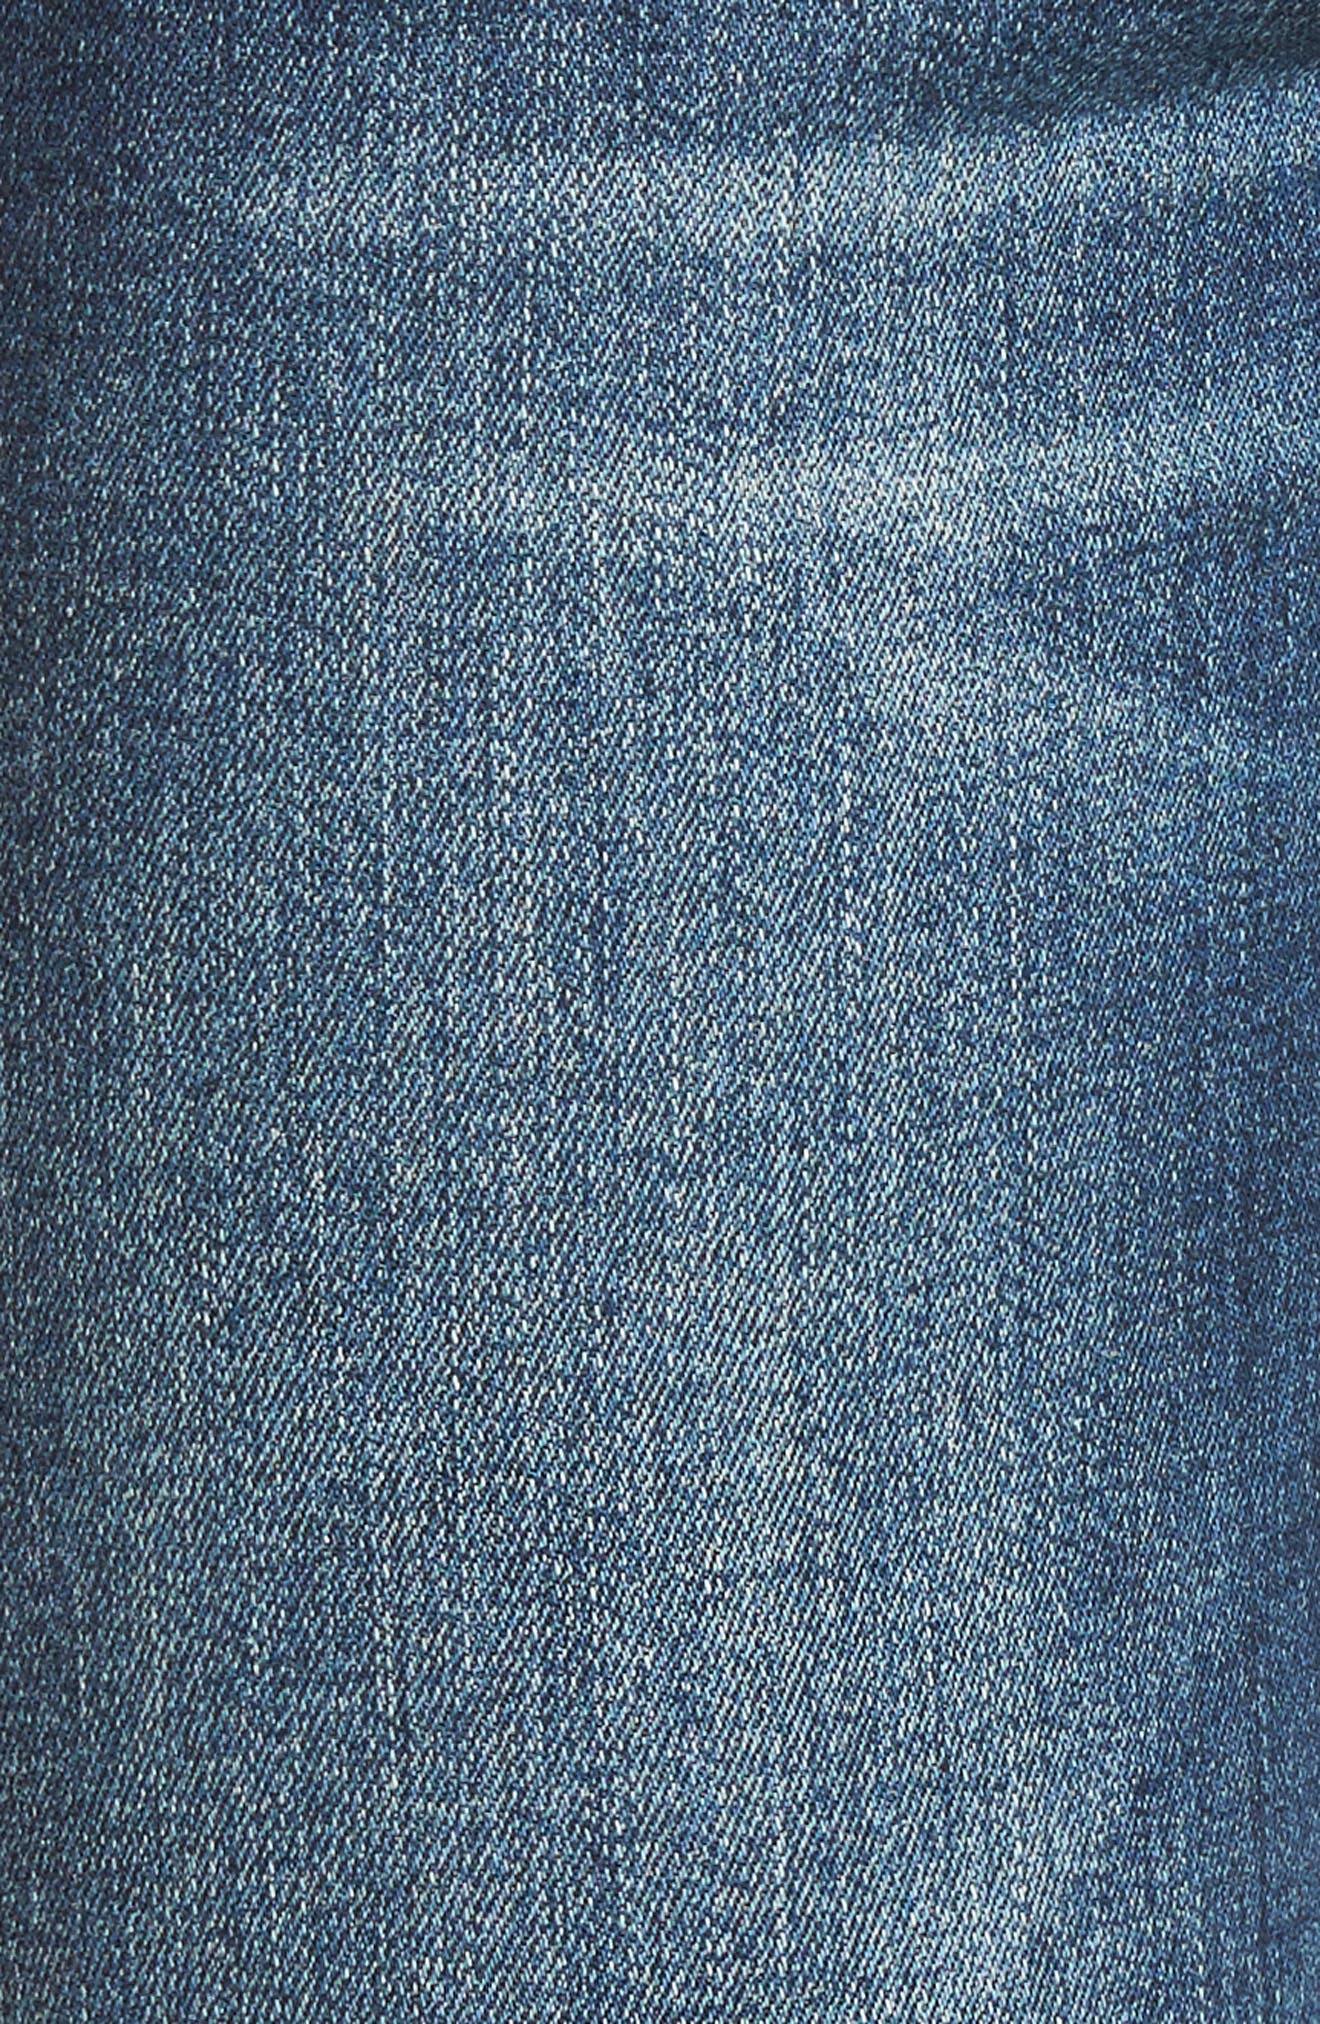 Piper Grommet Detail Skinny Jeans,                             Alternate thumbnail 5, color,                             Westgate